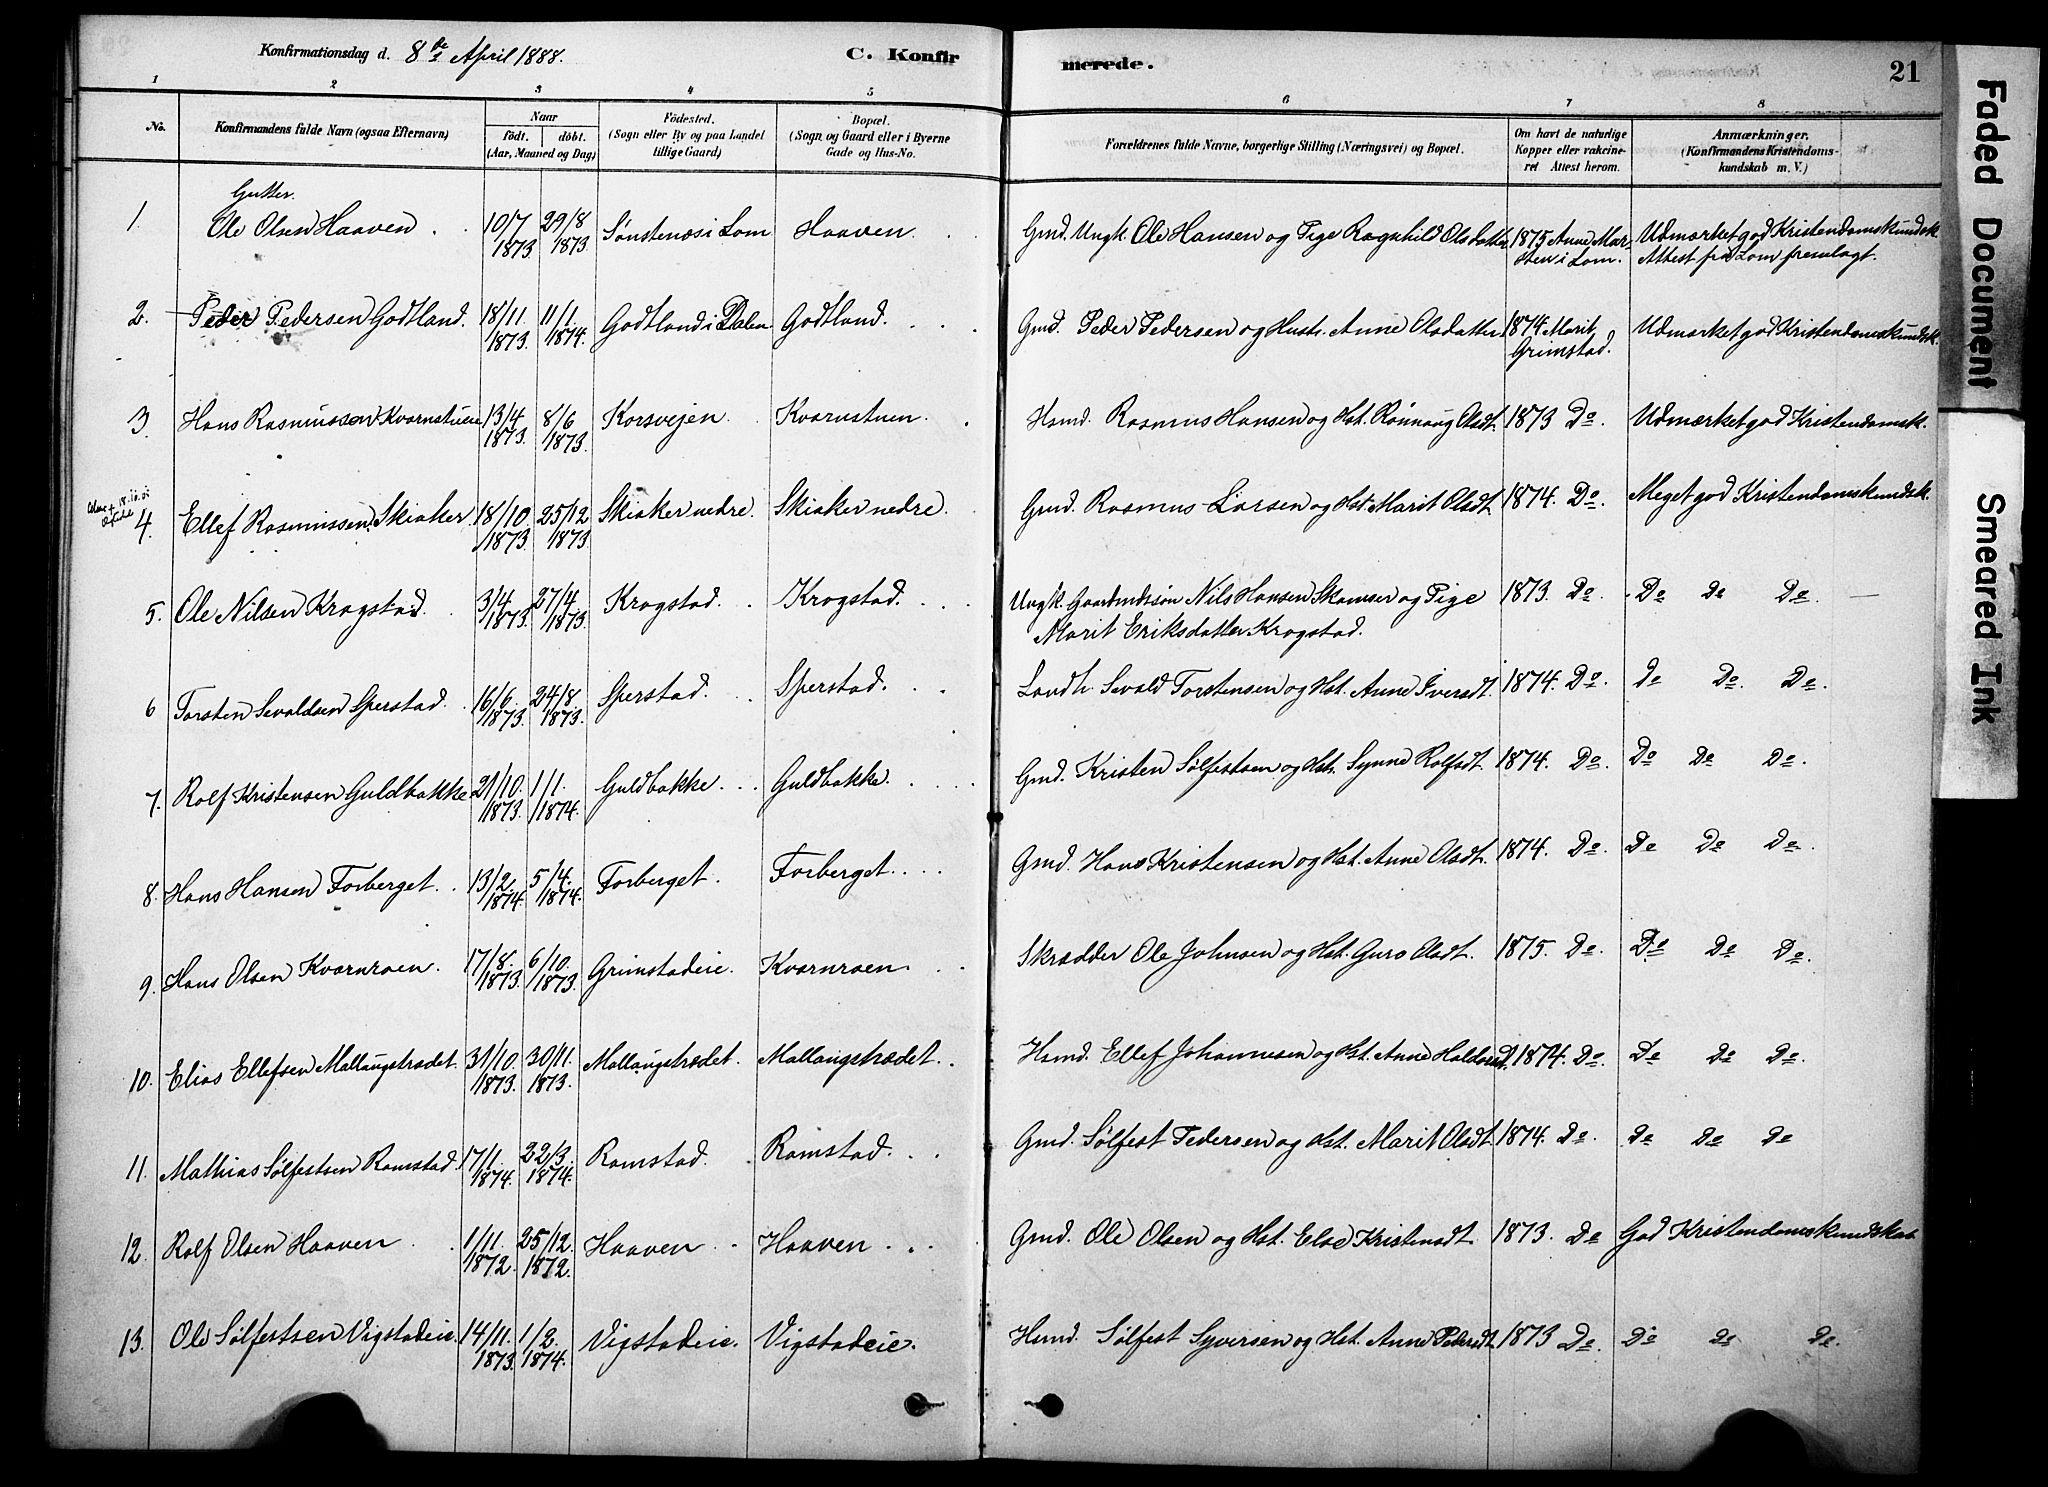 SAH, Skjåk prestekontor, Ministerialbok nr. 2, 1878-1907, s. 21